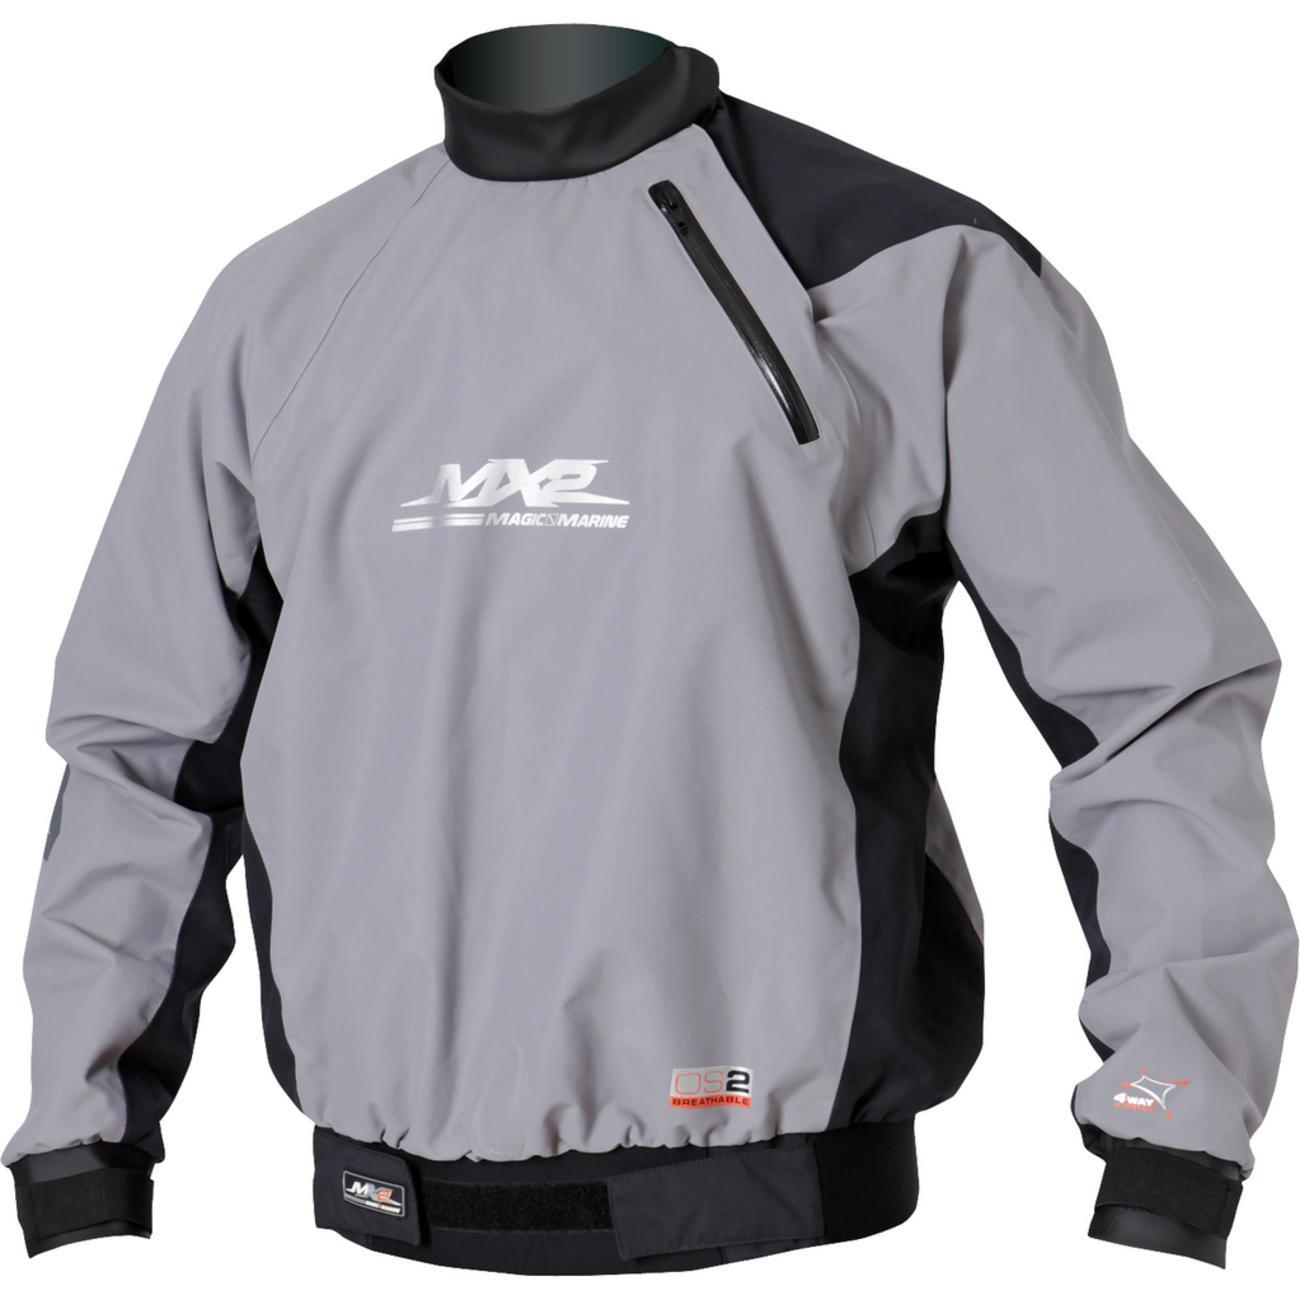 COASTAL Br. SPRAYTOP 2L 2レイヤーパドリングジャケット